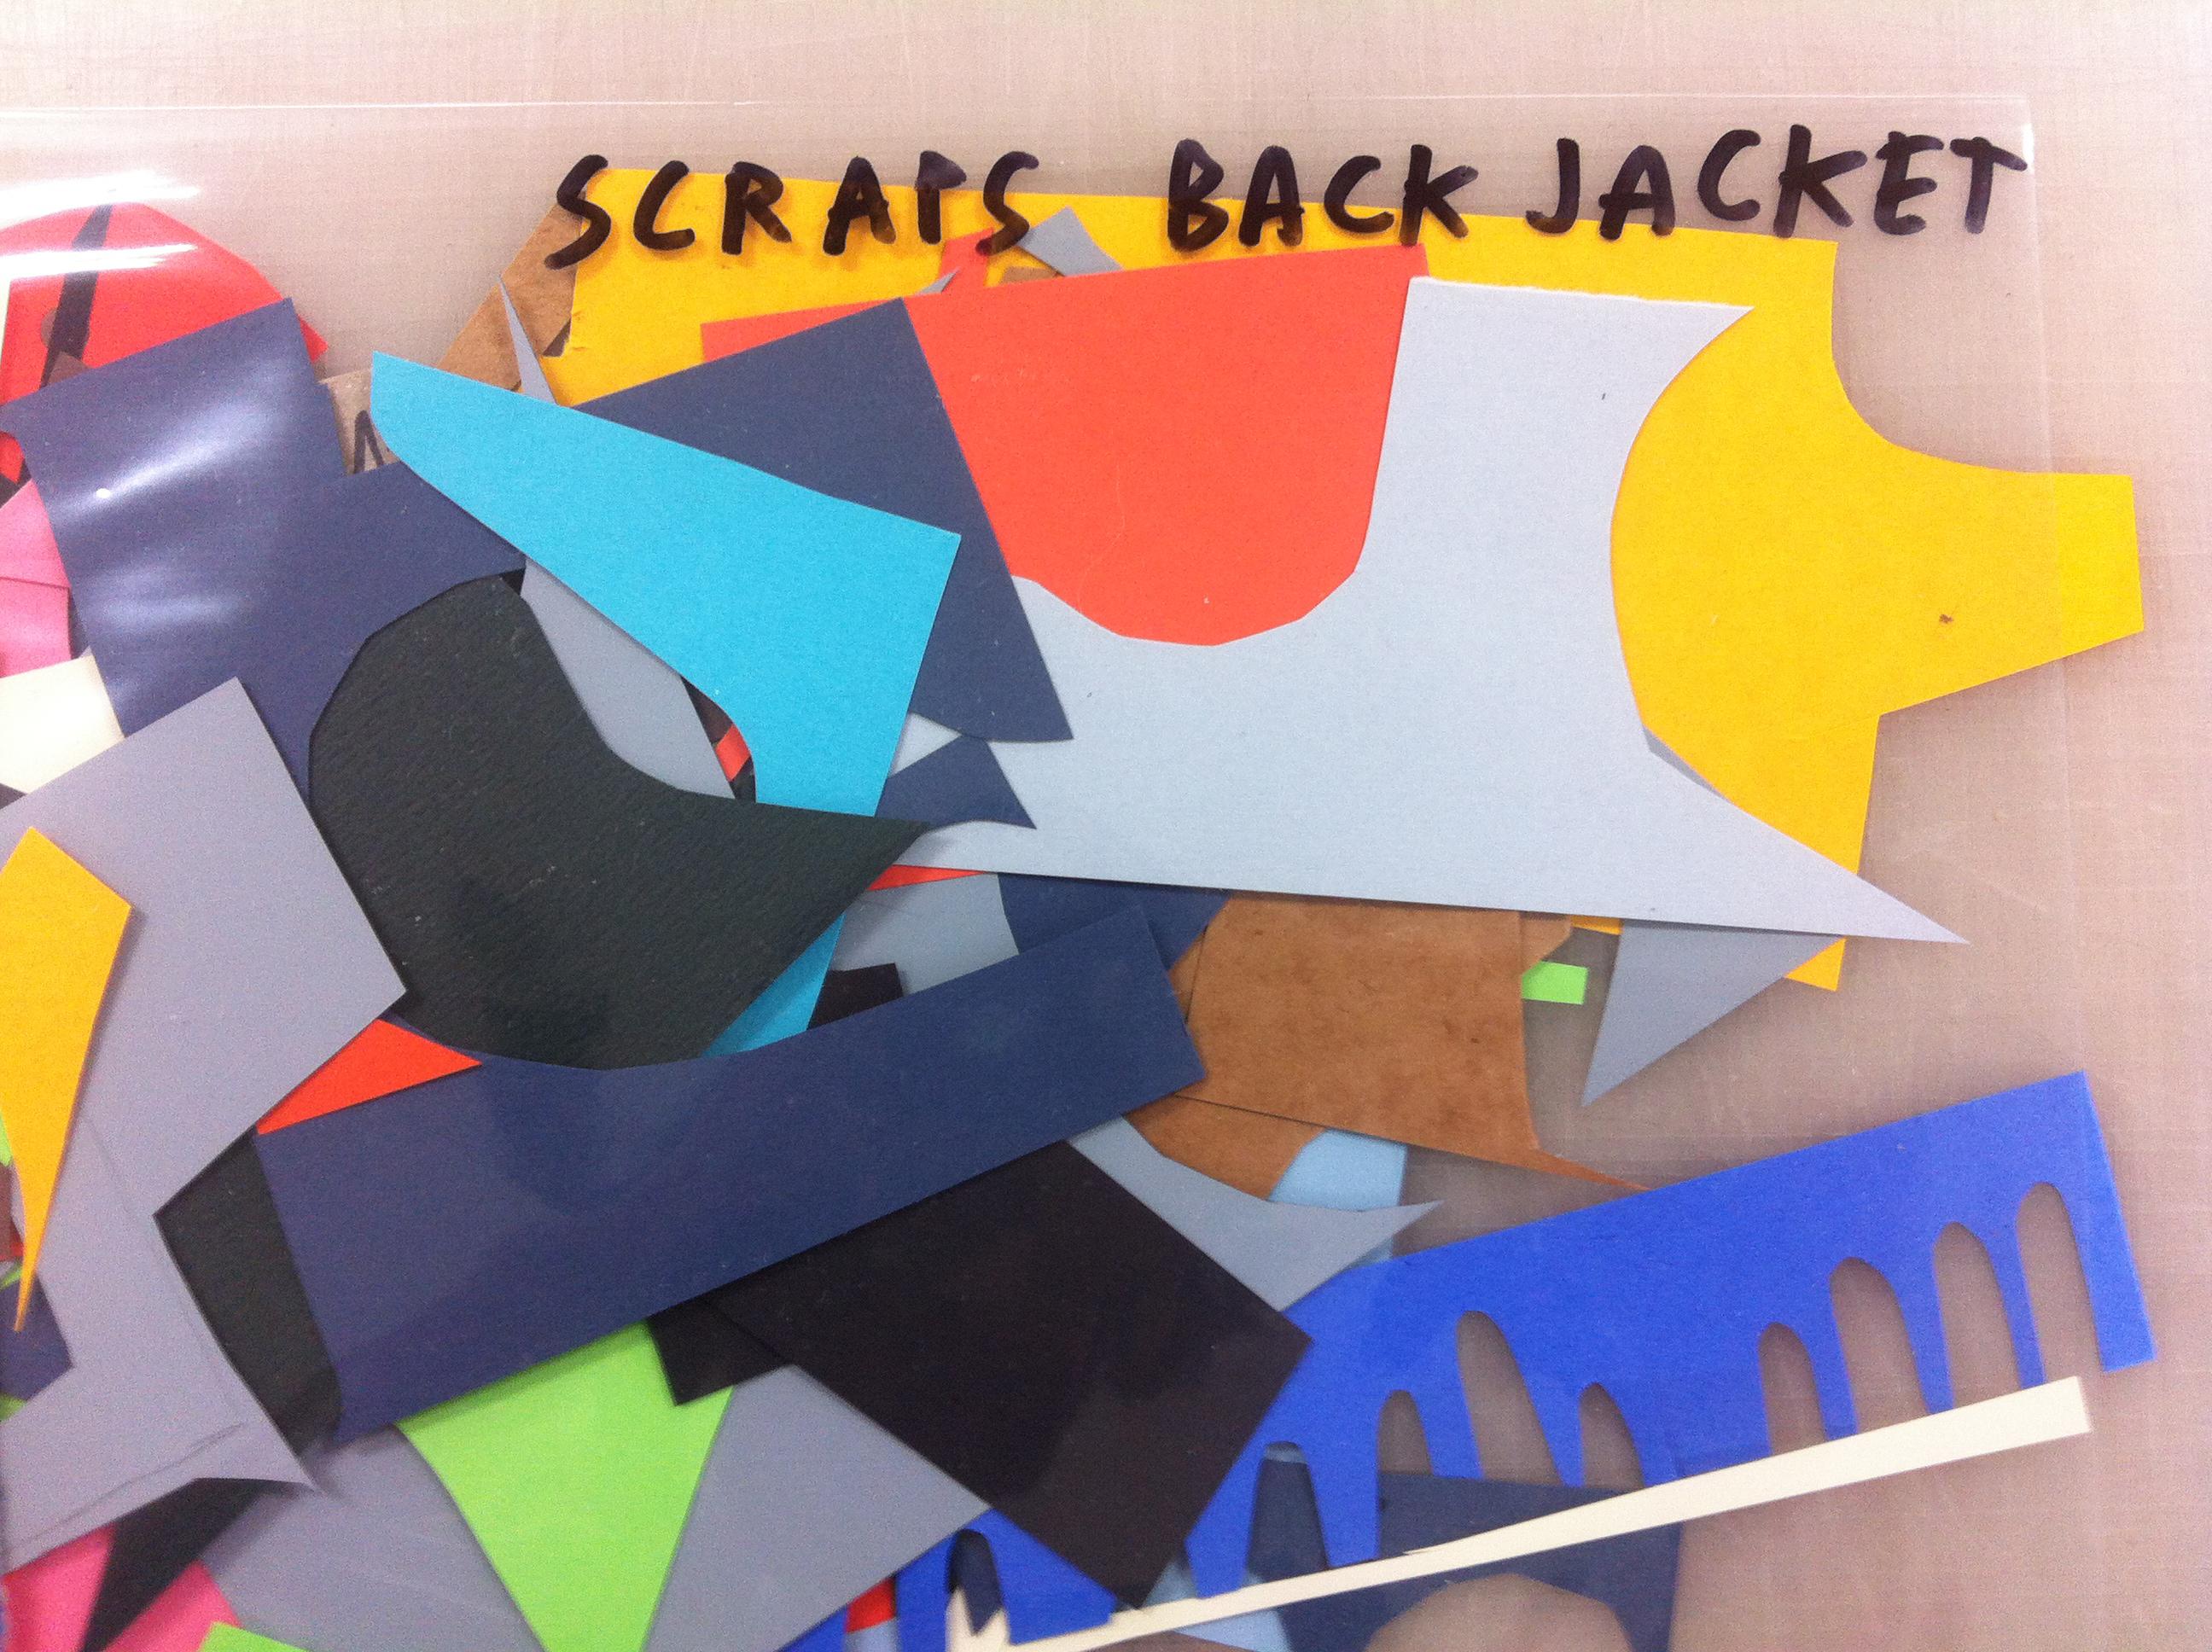 Scraps Back Jacket